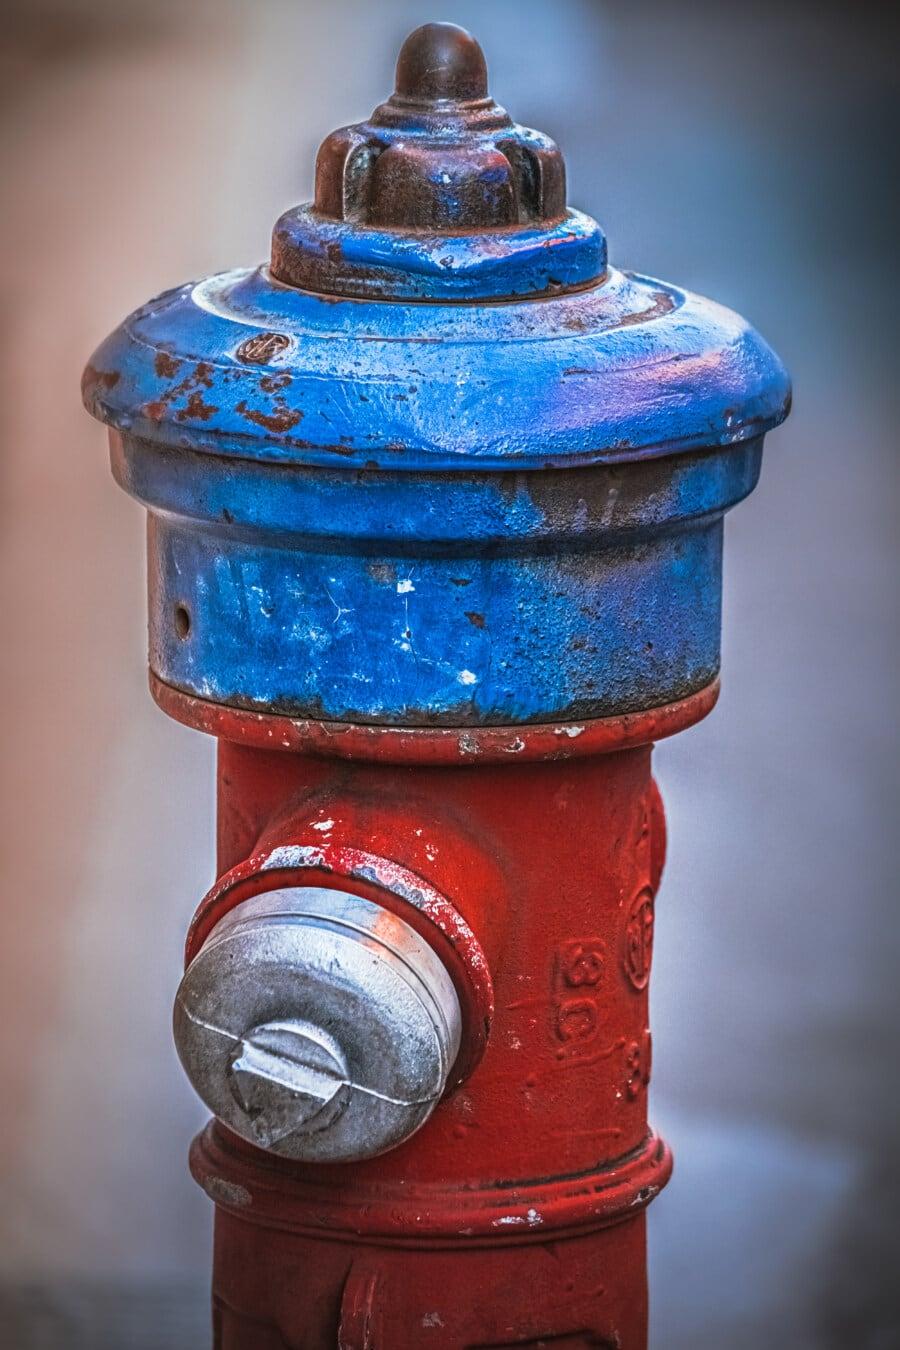 dark blue, hydrant, dark red, object, industrial, cast iron, old, antique, retro, steel